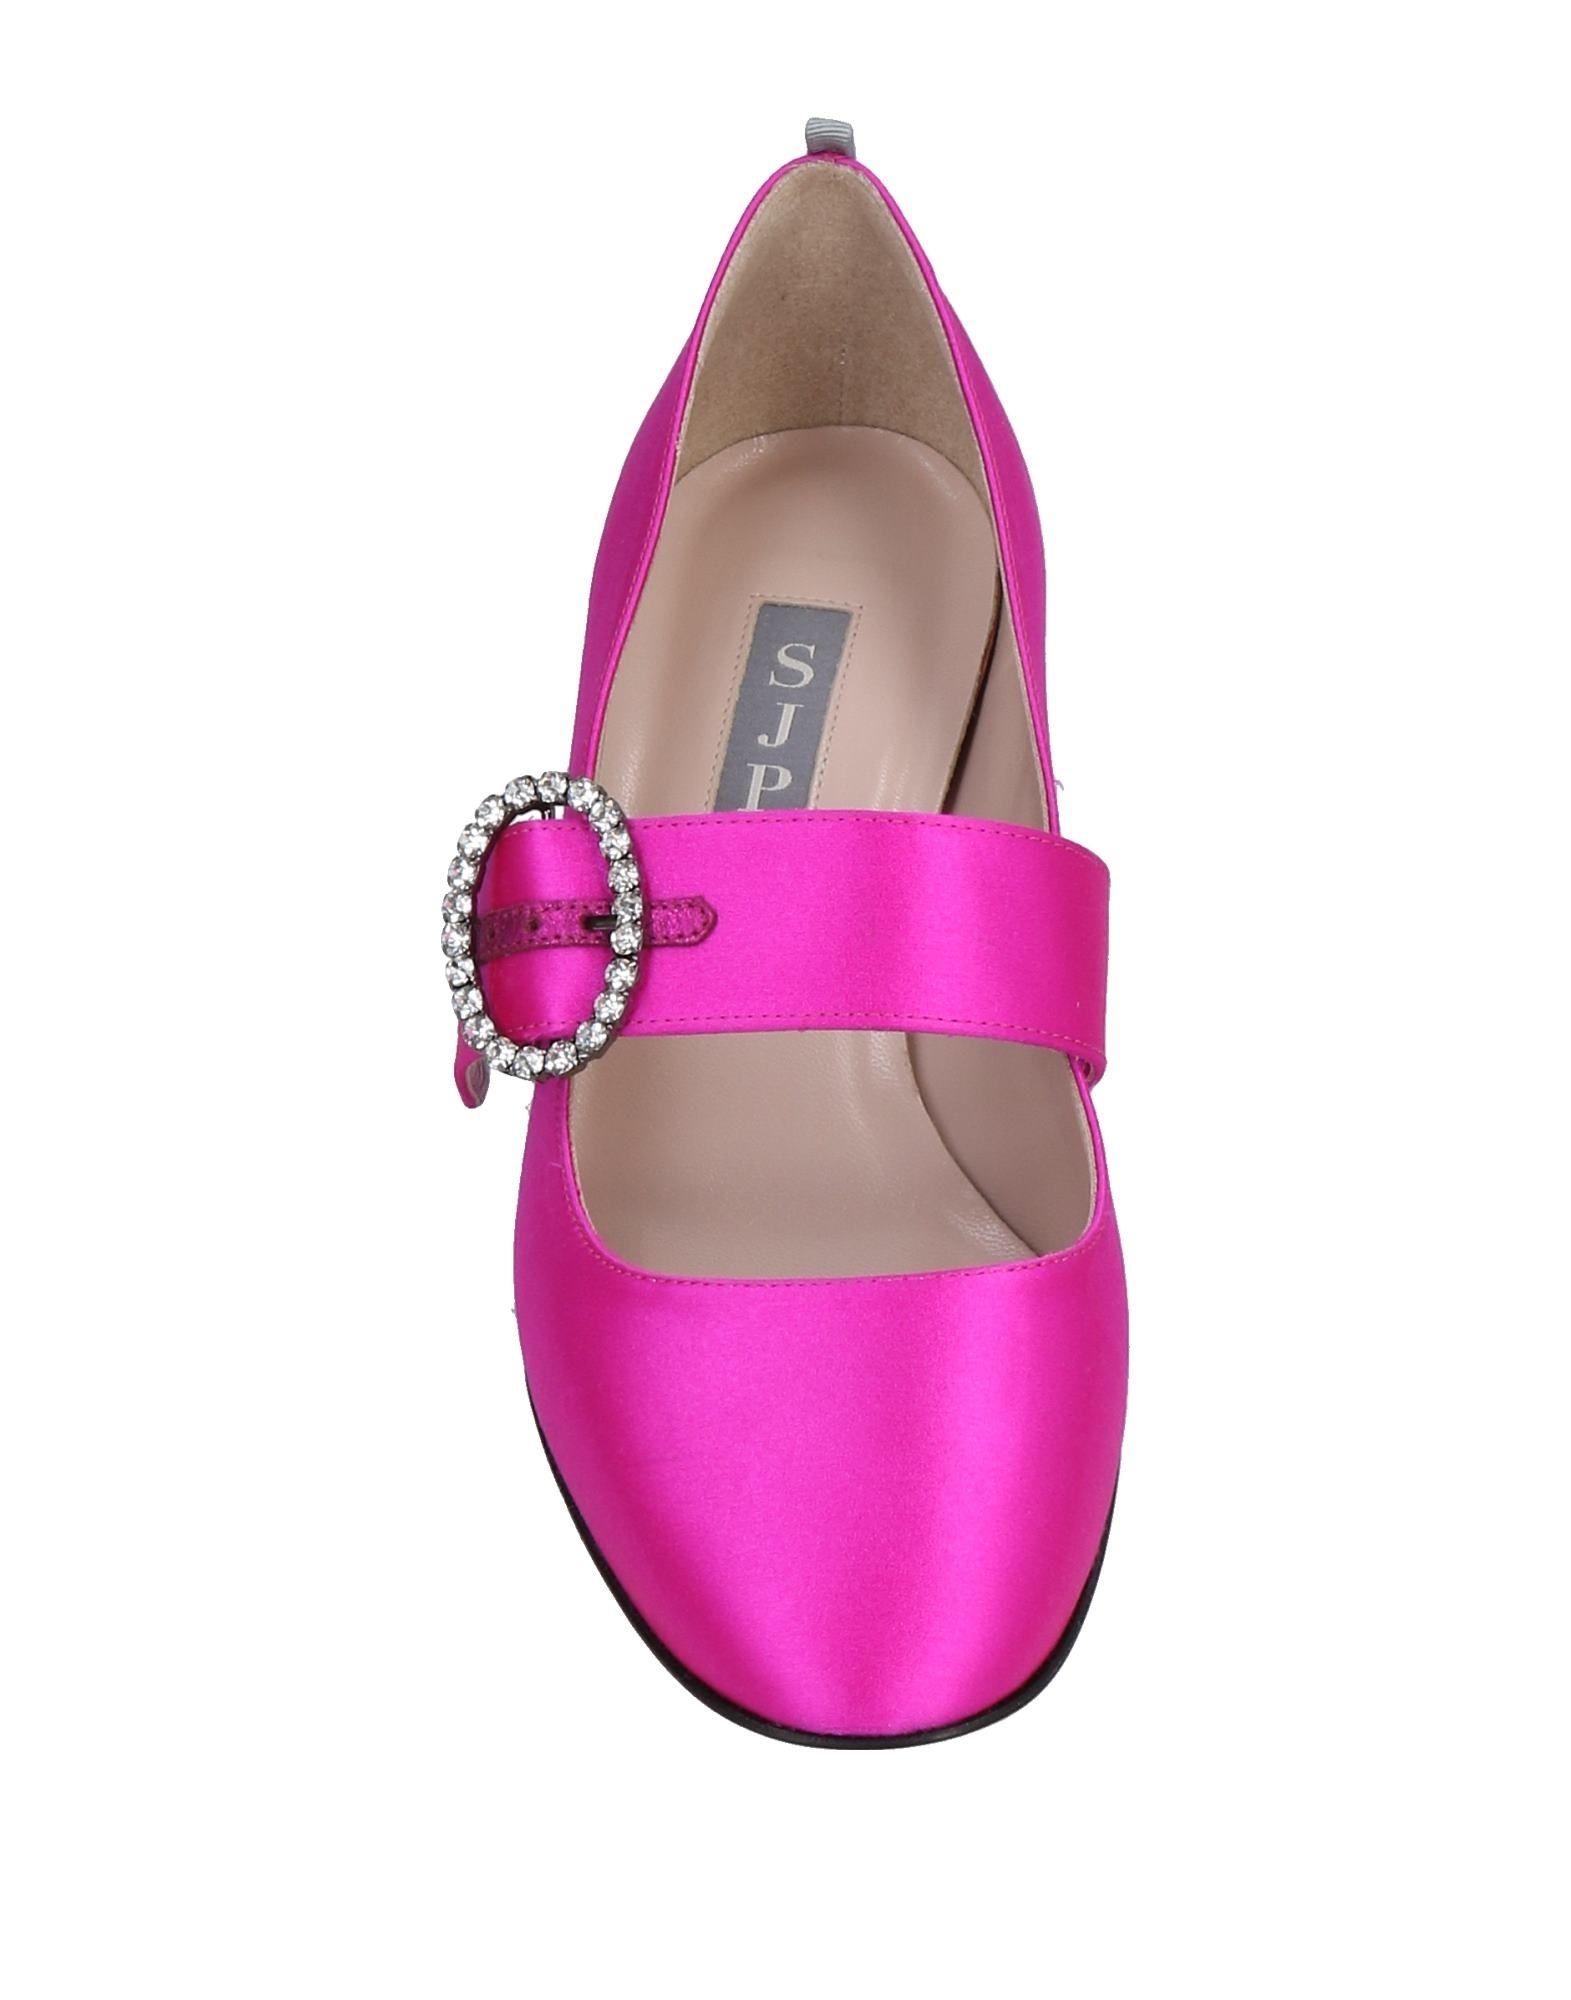 Stilvolle billige Jessica Schuhe Sjp By Sarah Jessica billige Parker Pumps Damen  11462906MU 7e32cd